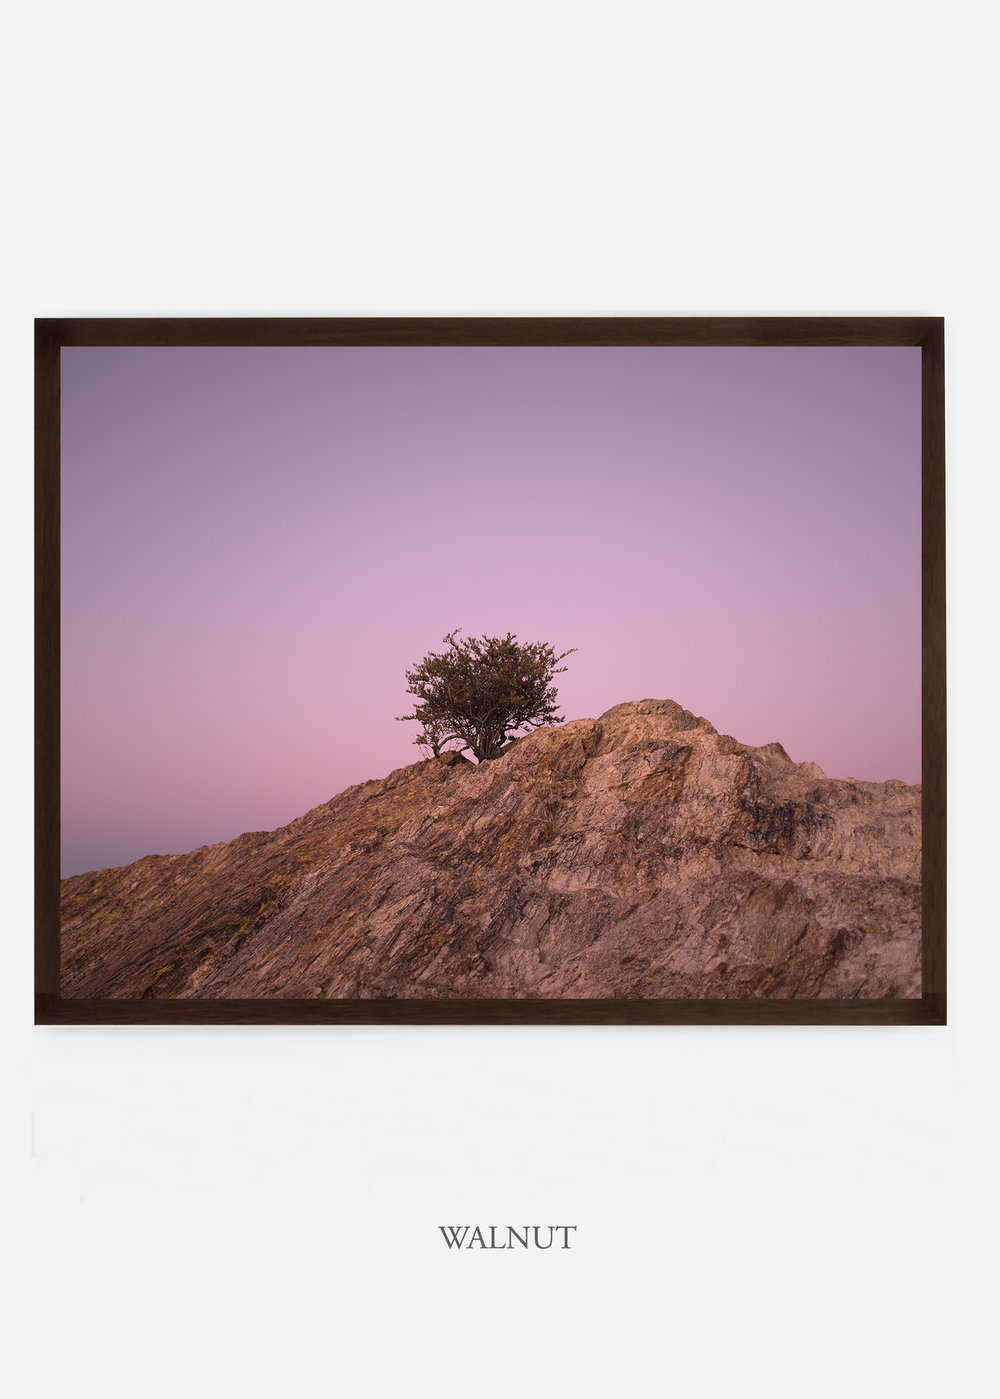 nomat_walnutframe-saguaroNo.11-wildercalifornia-art-wallart-cactusprint-homedecor-prints-arizona-botanical-artwork-interiordesign.jpg